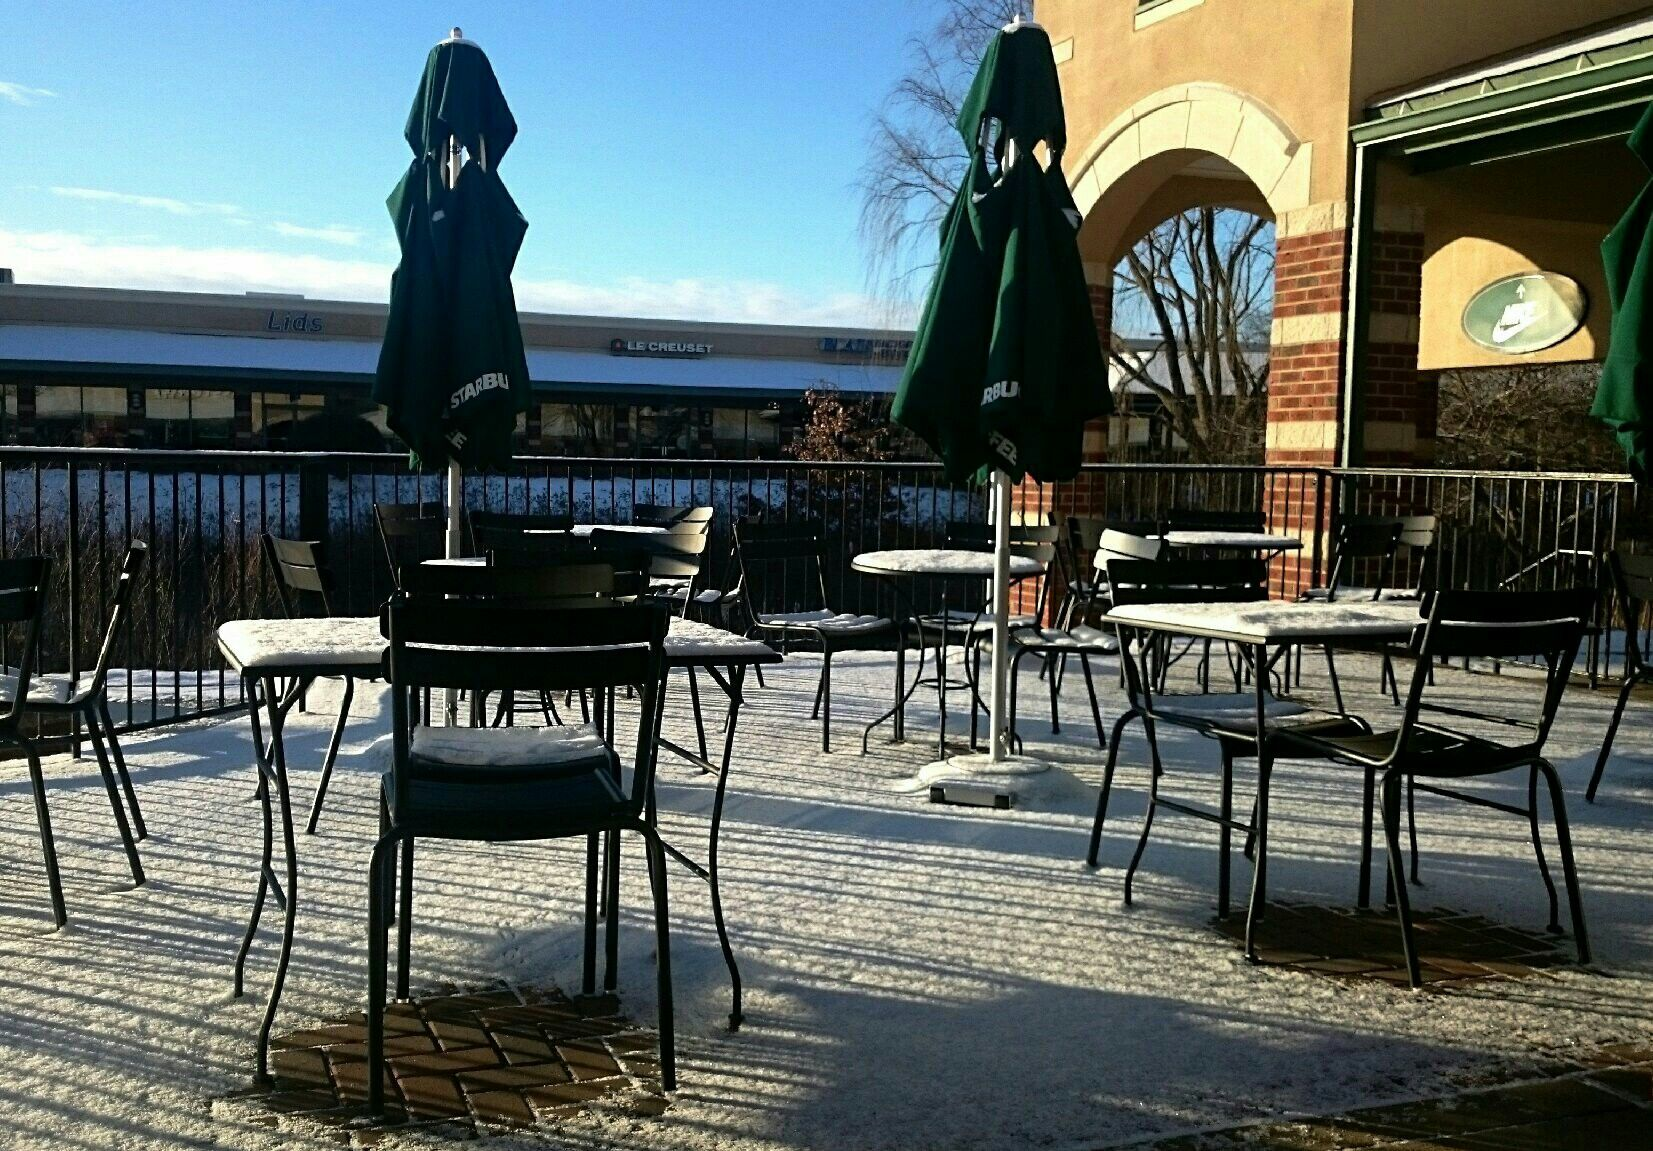 Starbucks at Premium Outlets